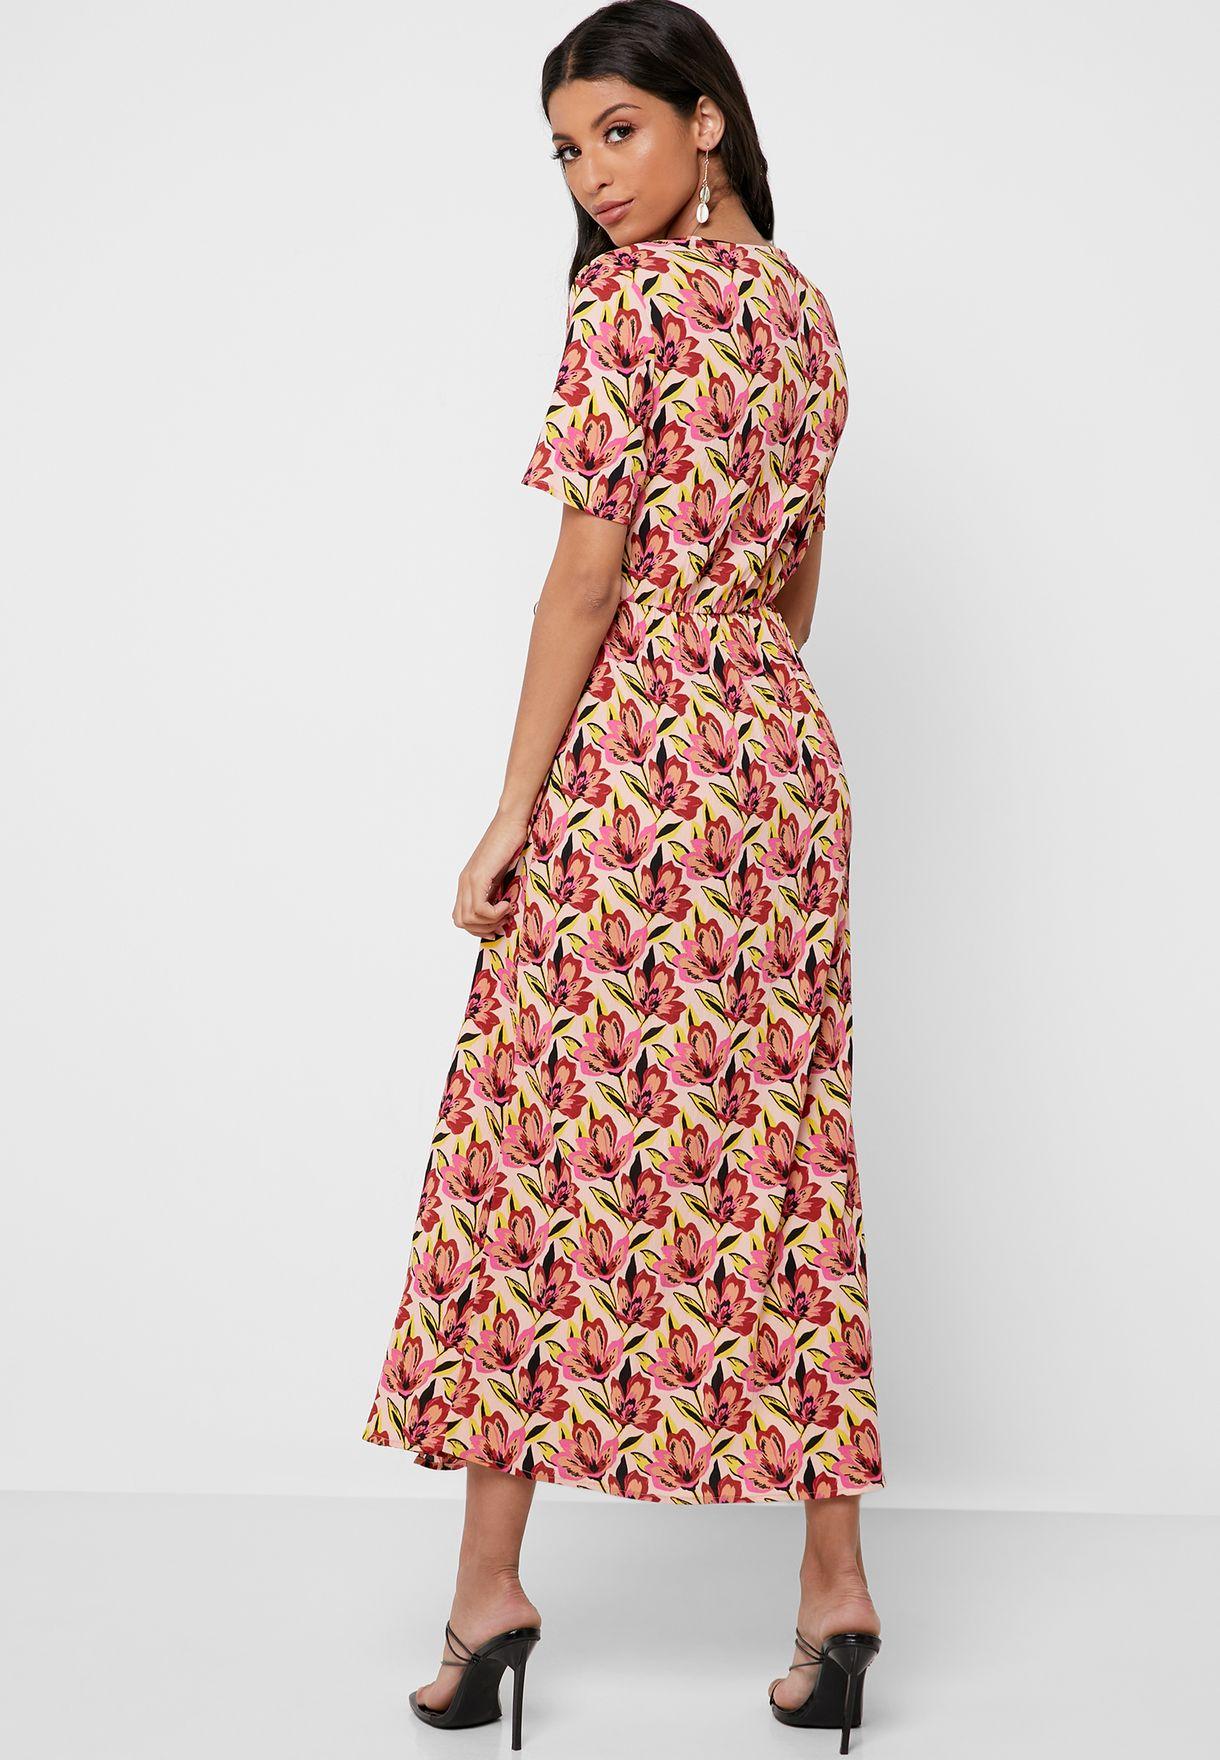 Floral Print Tie Wrap Dress